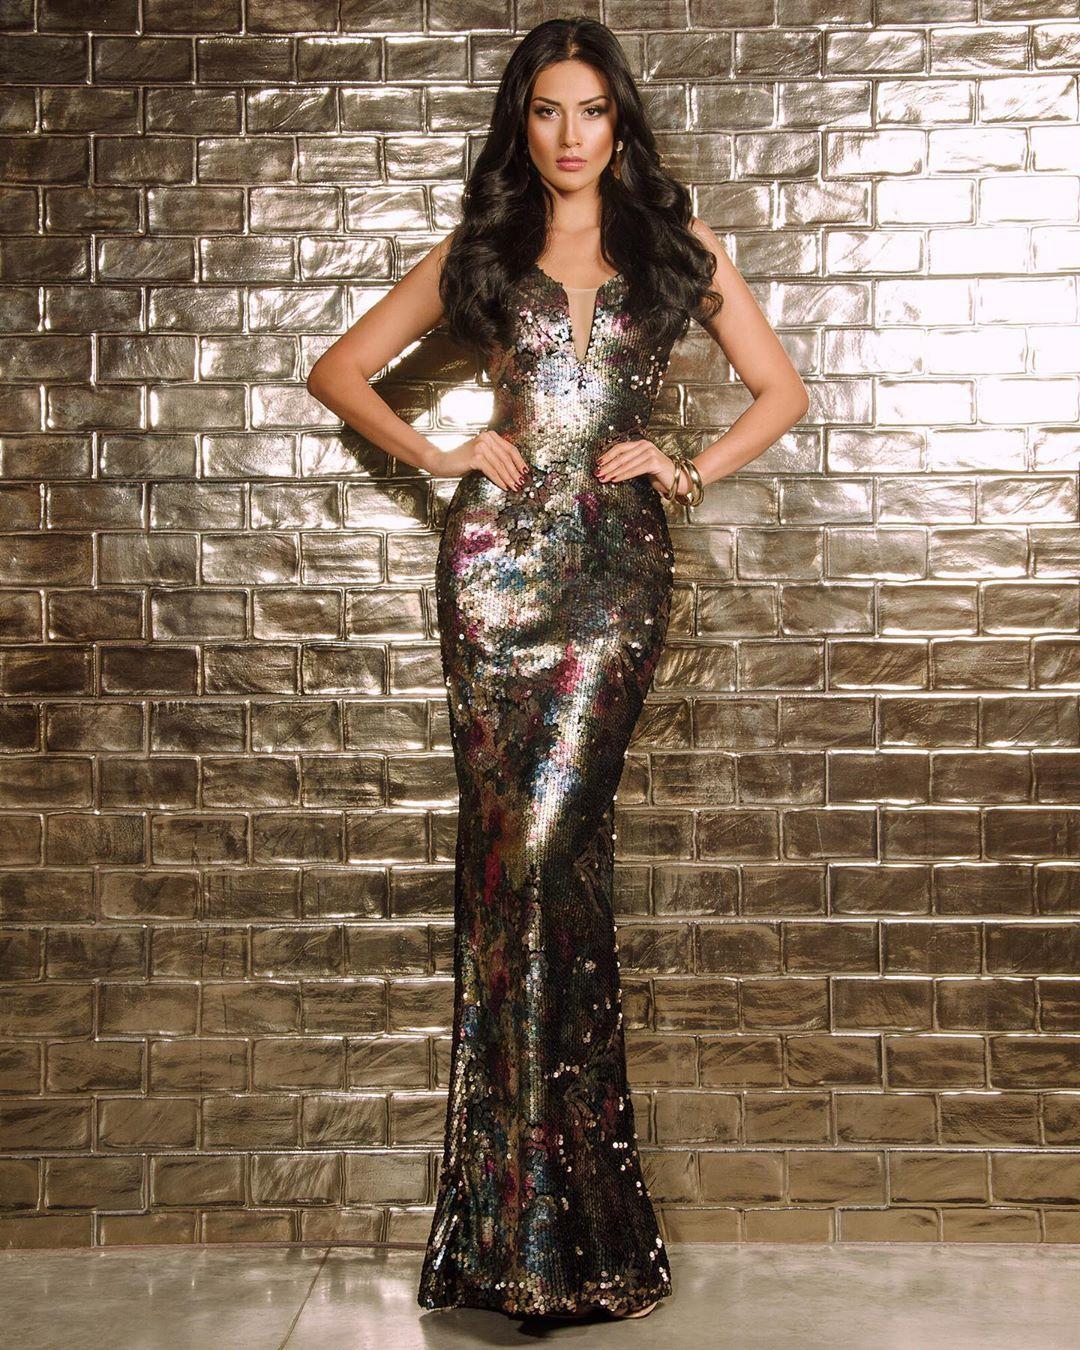 yenny katherine carrillo, top 20 de miss earth 2019/reyna mundial banano 2017. - Página 5 69116510